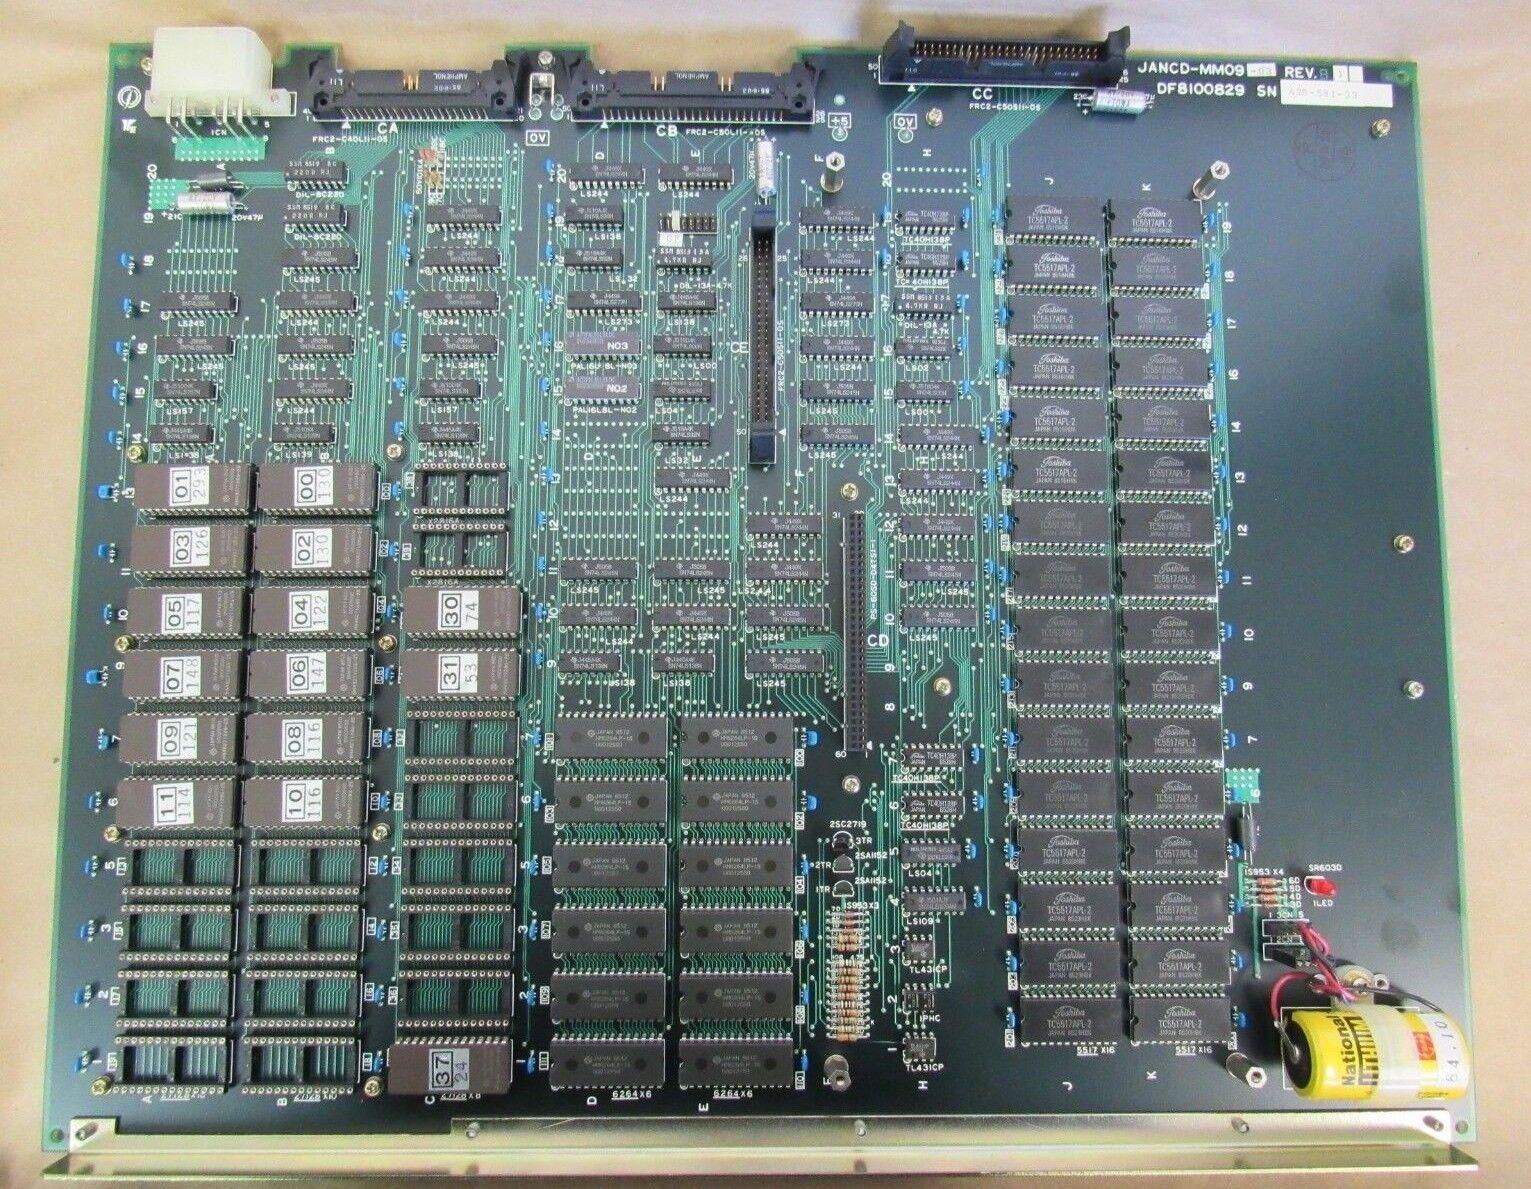 YASKAWA CIRCUIT BOARD JANCD-MM09-03 REV B1, DF8100829